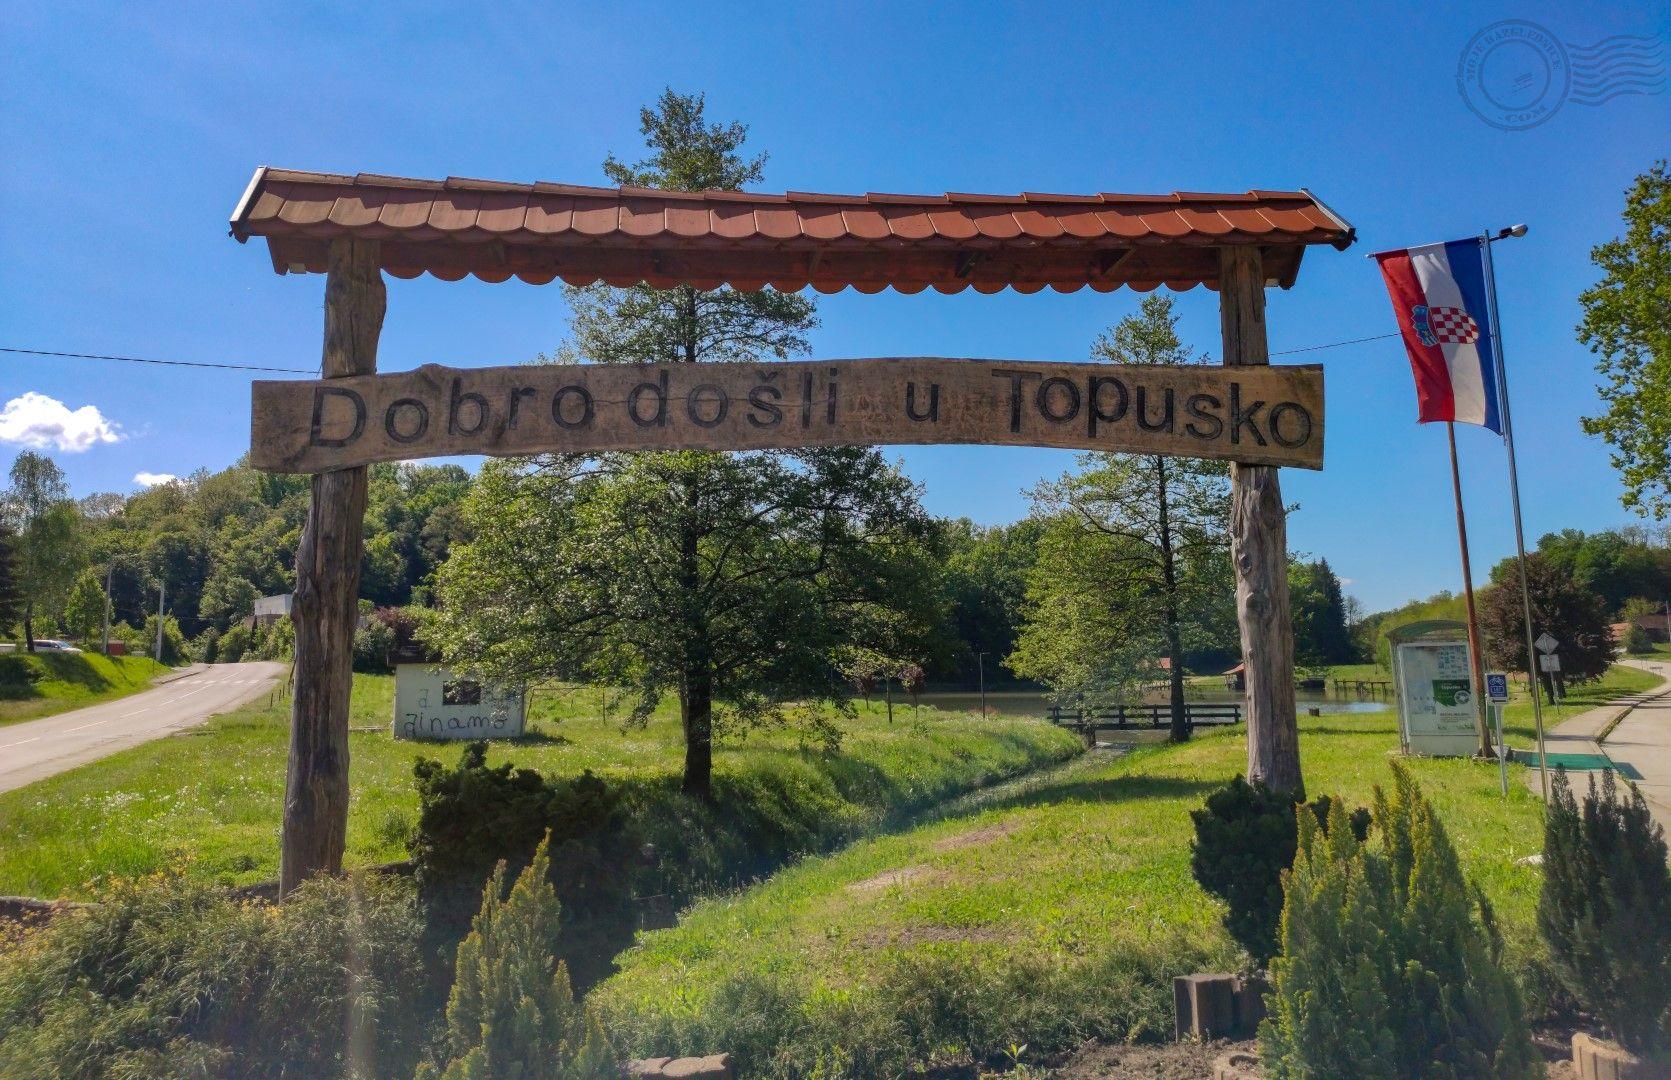 Topusko i Hrvatsko Selo